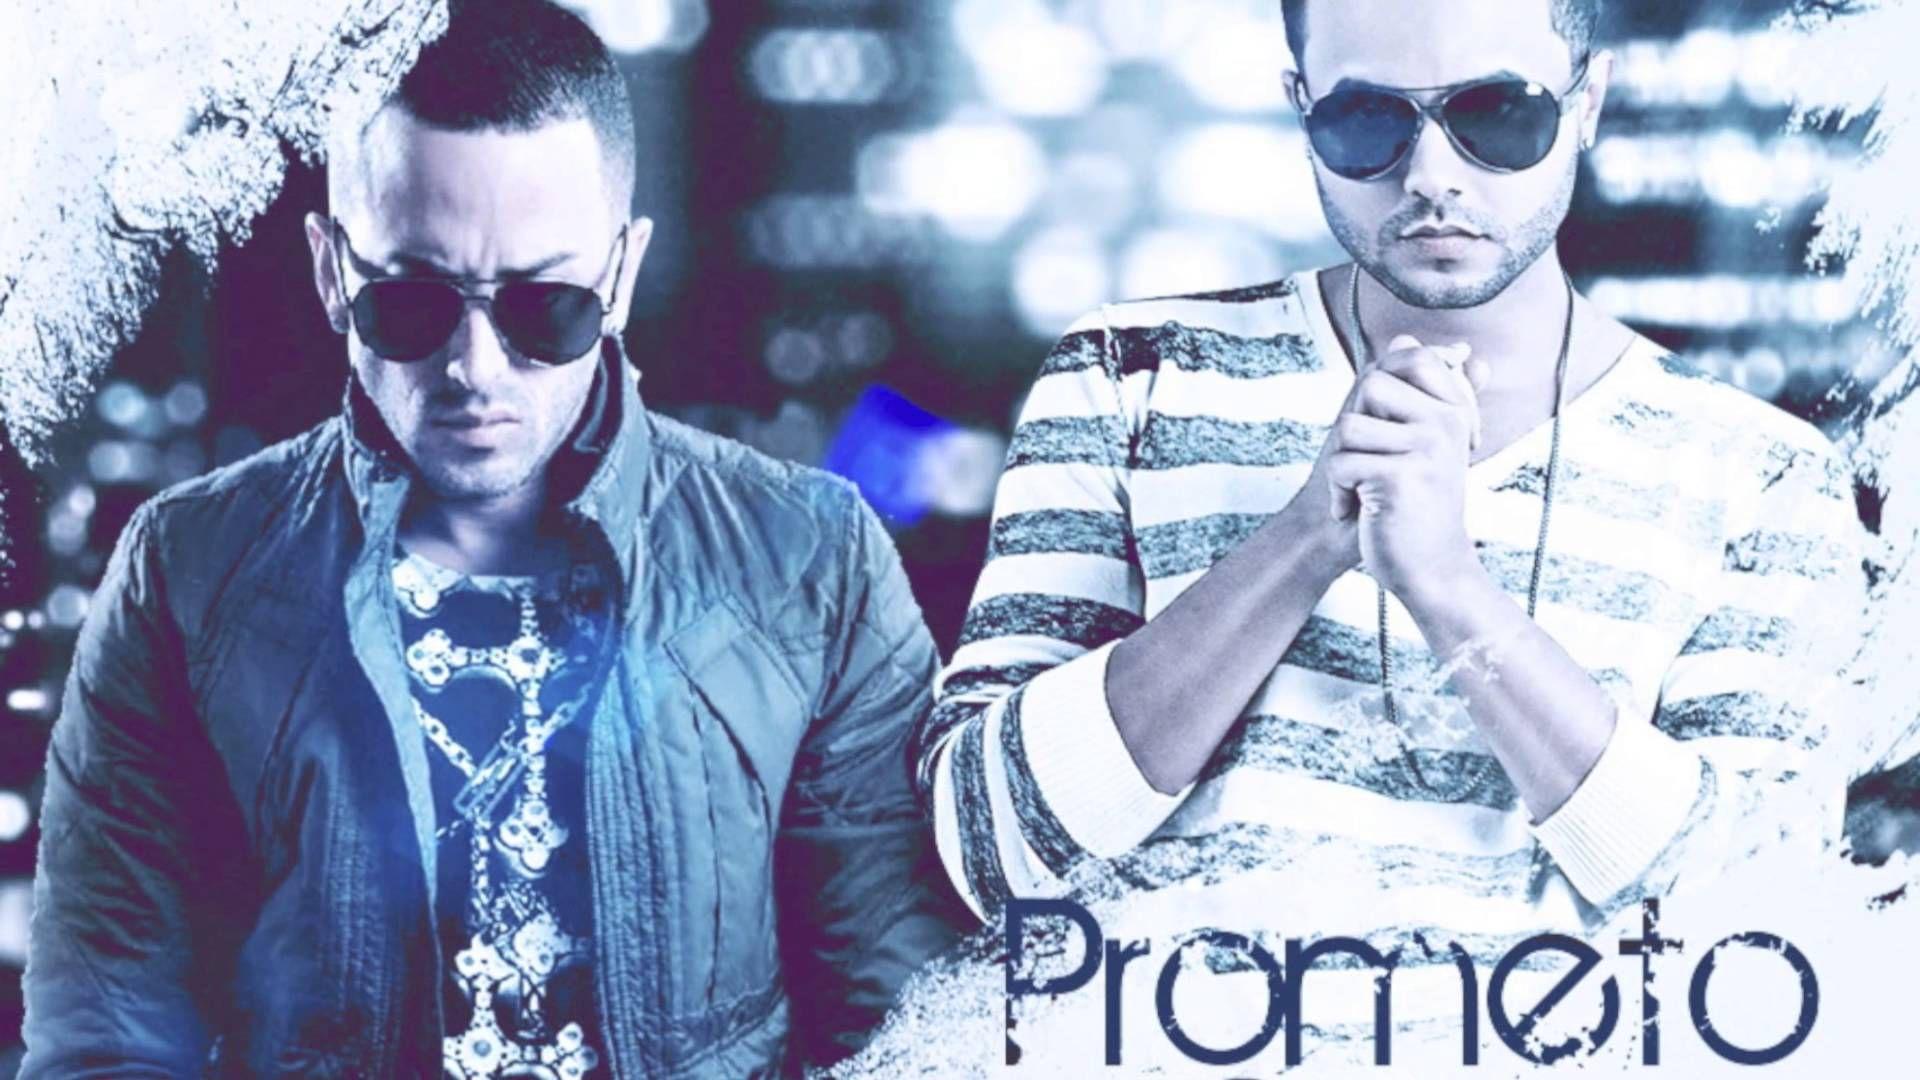 Prometo Olvidarte Remix Tony Dize Feat Yandel